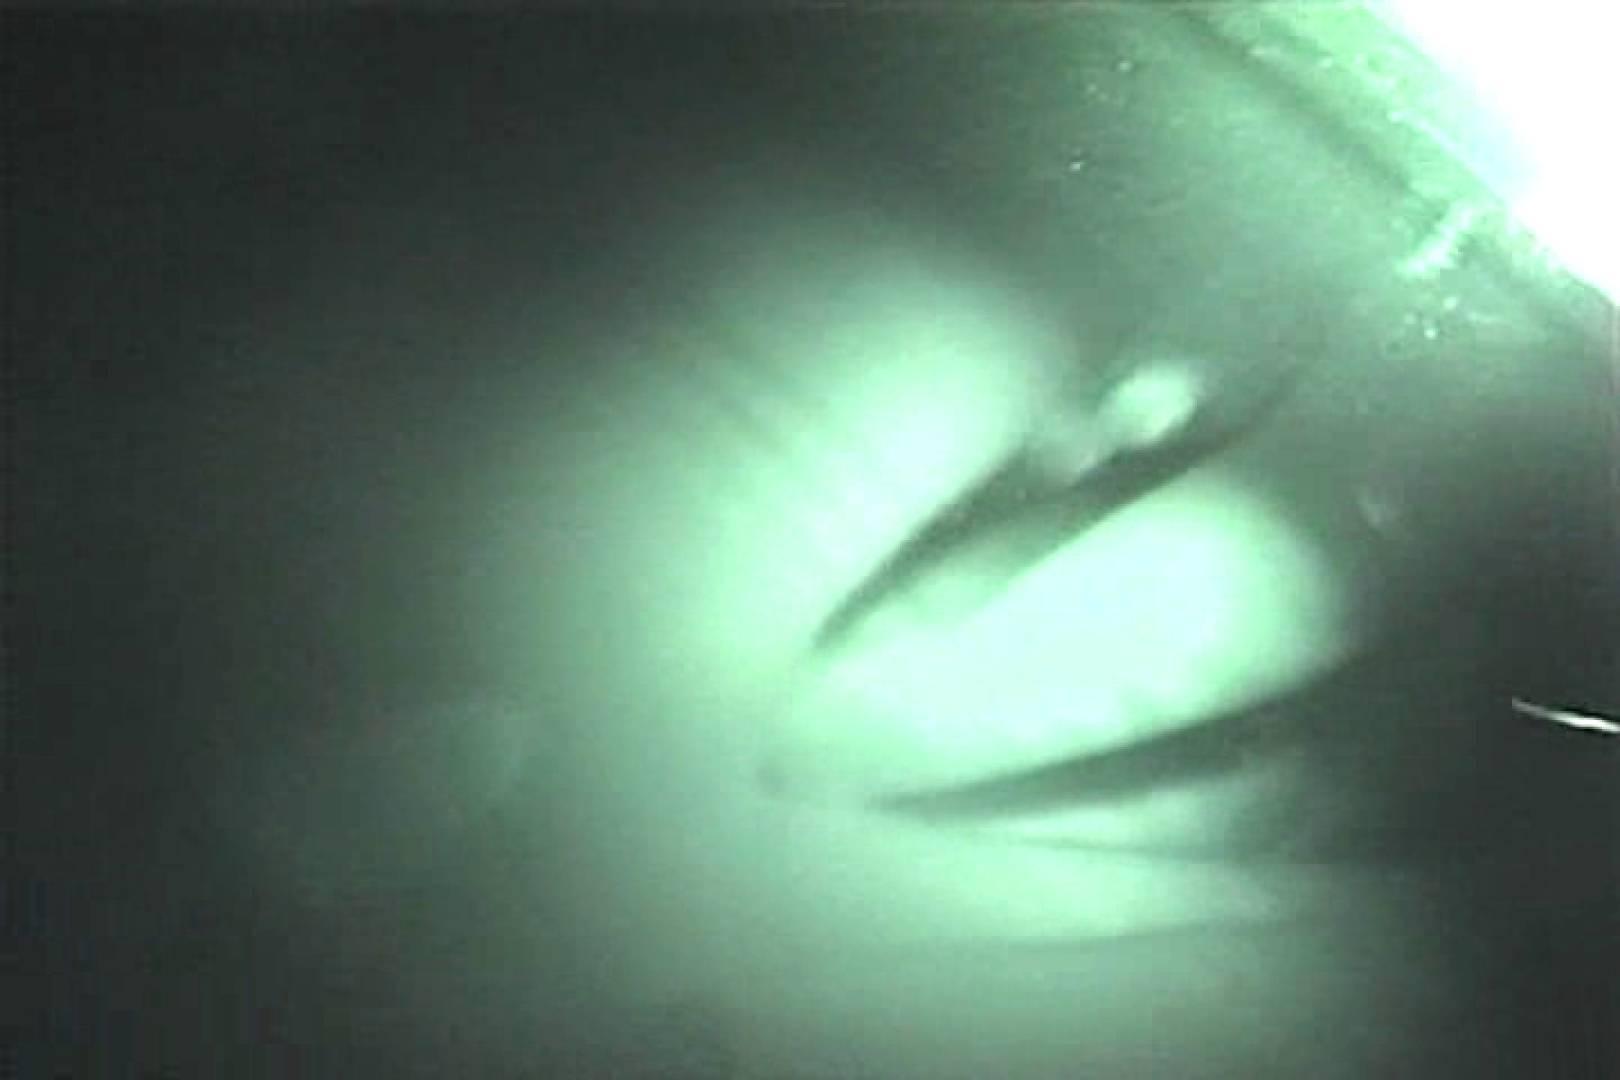 MASAさんの待ち伏せ撮り! 赤外線カーセックスVol.14 OLセックス 盗撮セックス無修正動画無料 107画像 11